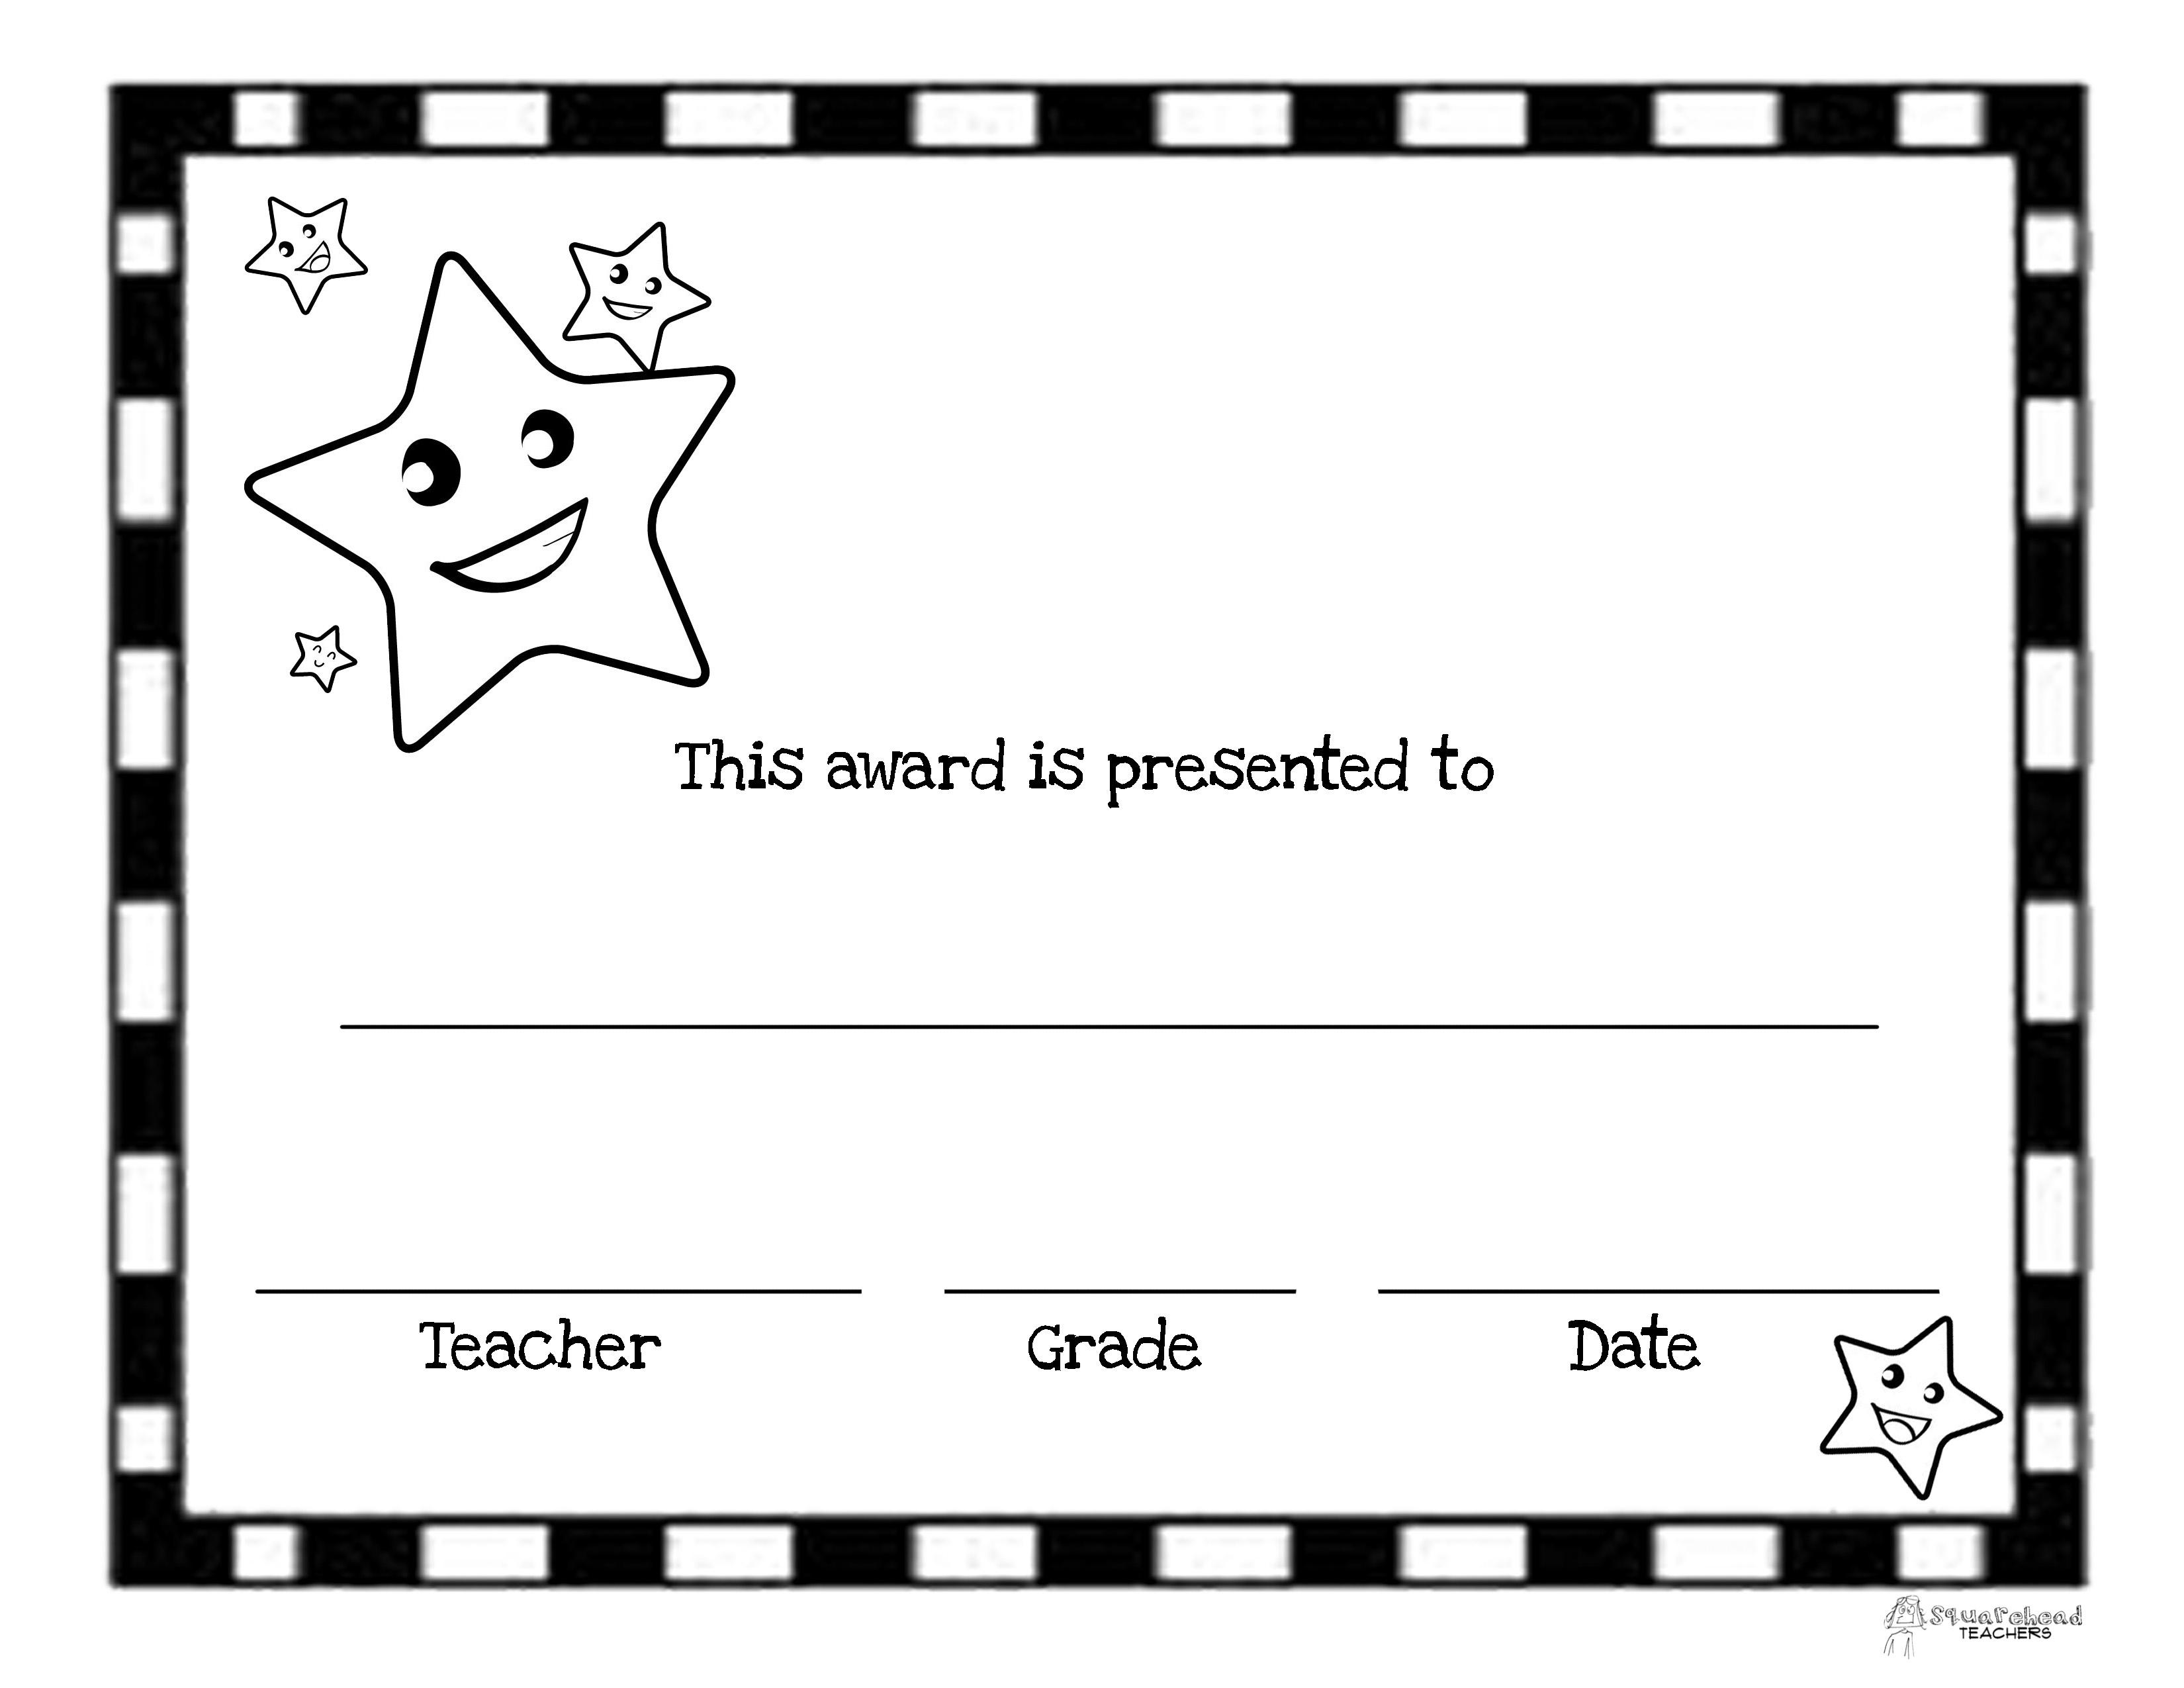 End Of The Year Awards (44 Printable Certificates) | Squarehead Teachers - Free Printable Awards